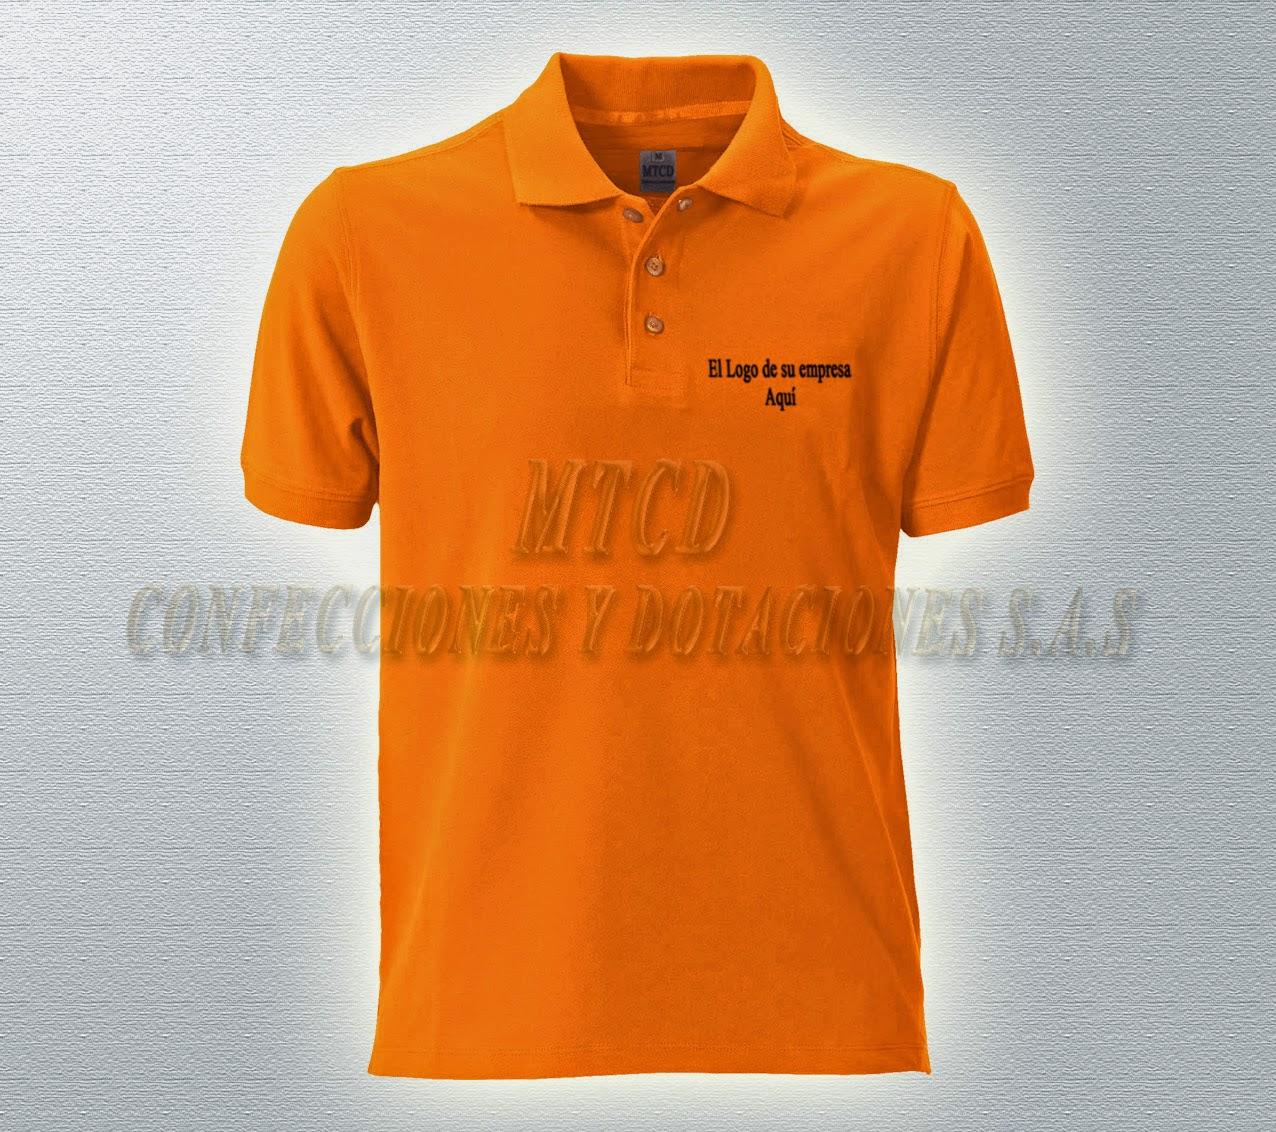 Fabrica de camisas polo bordadas